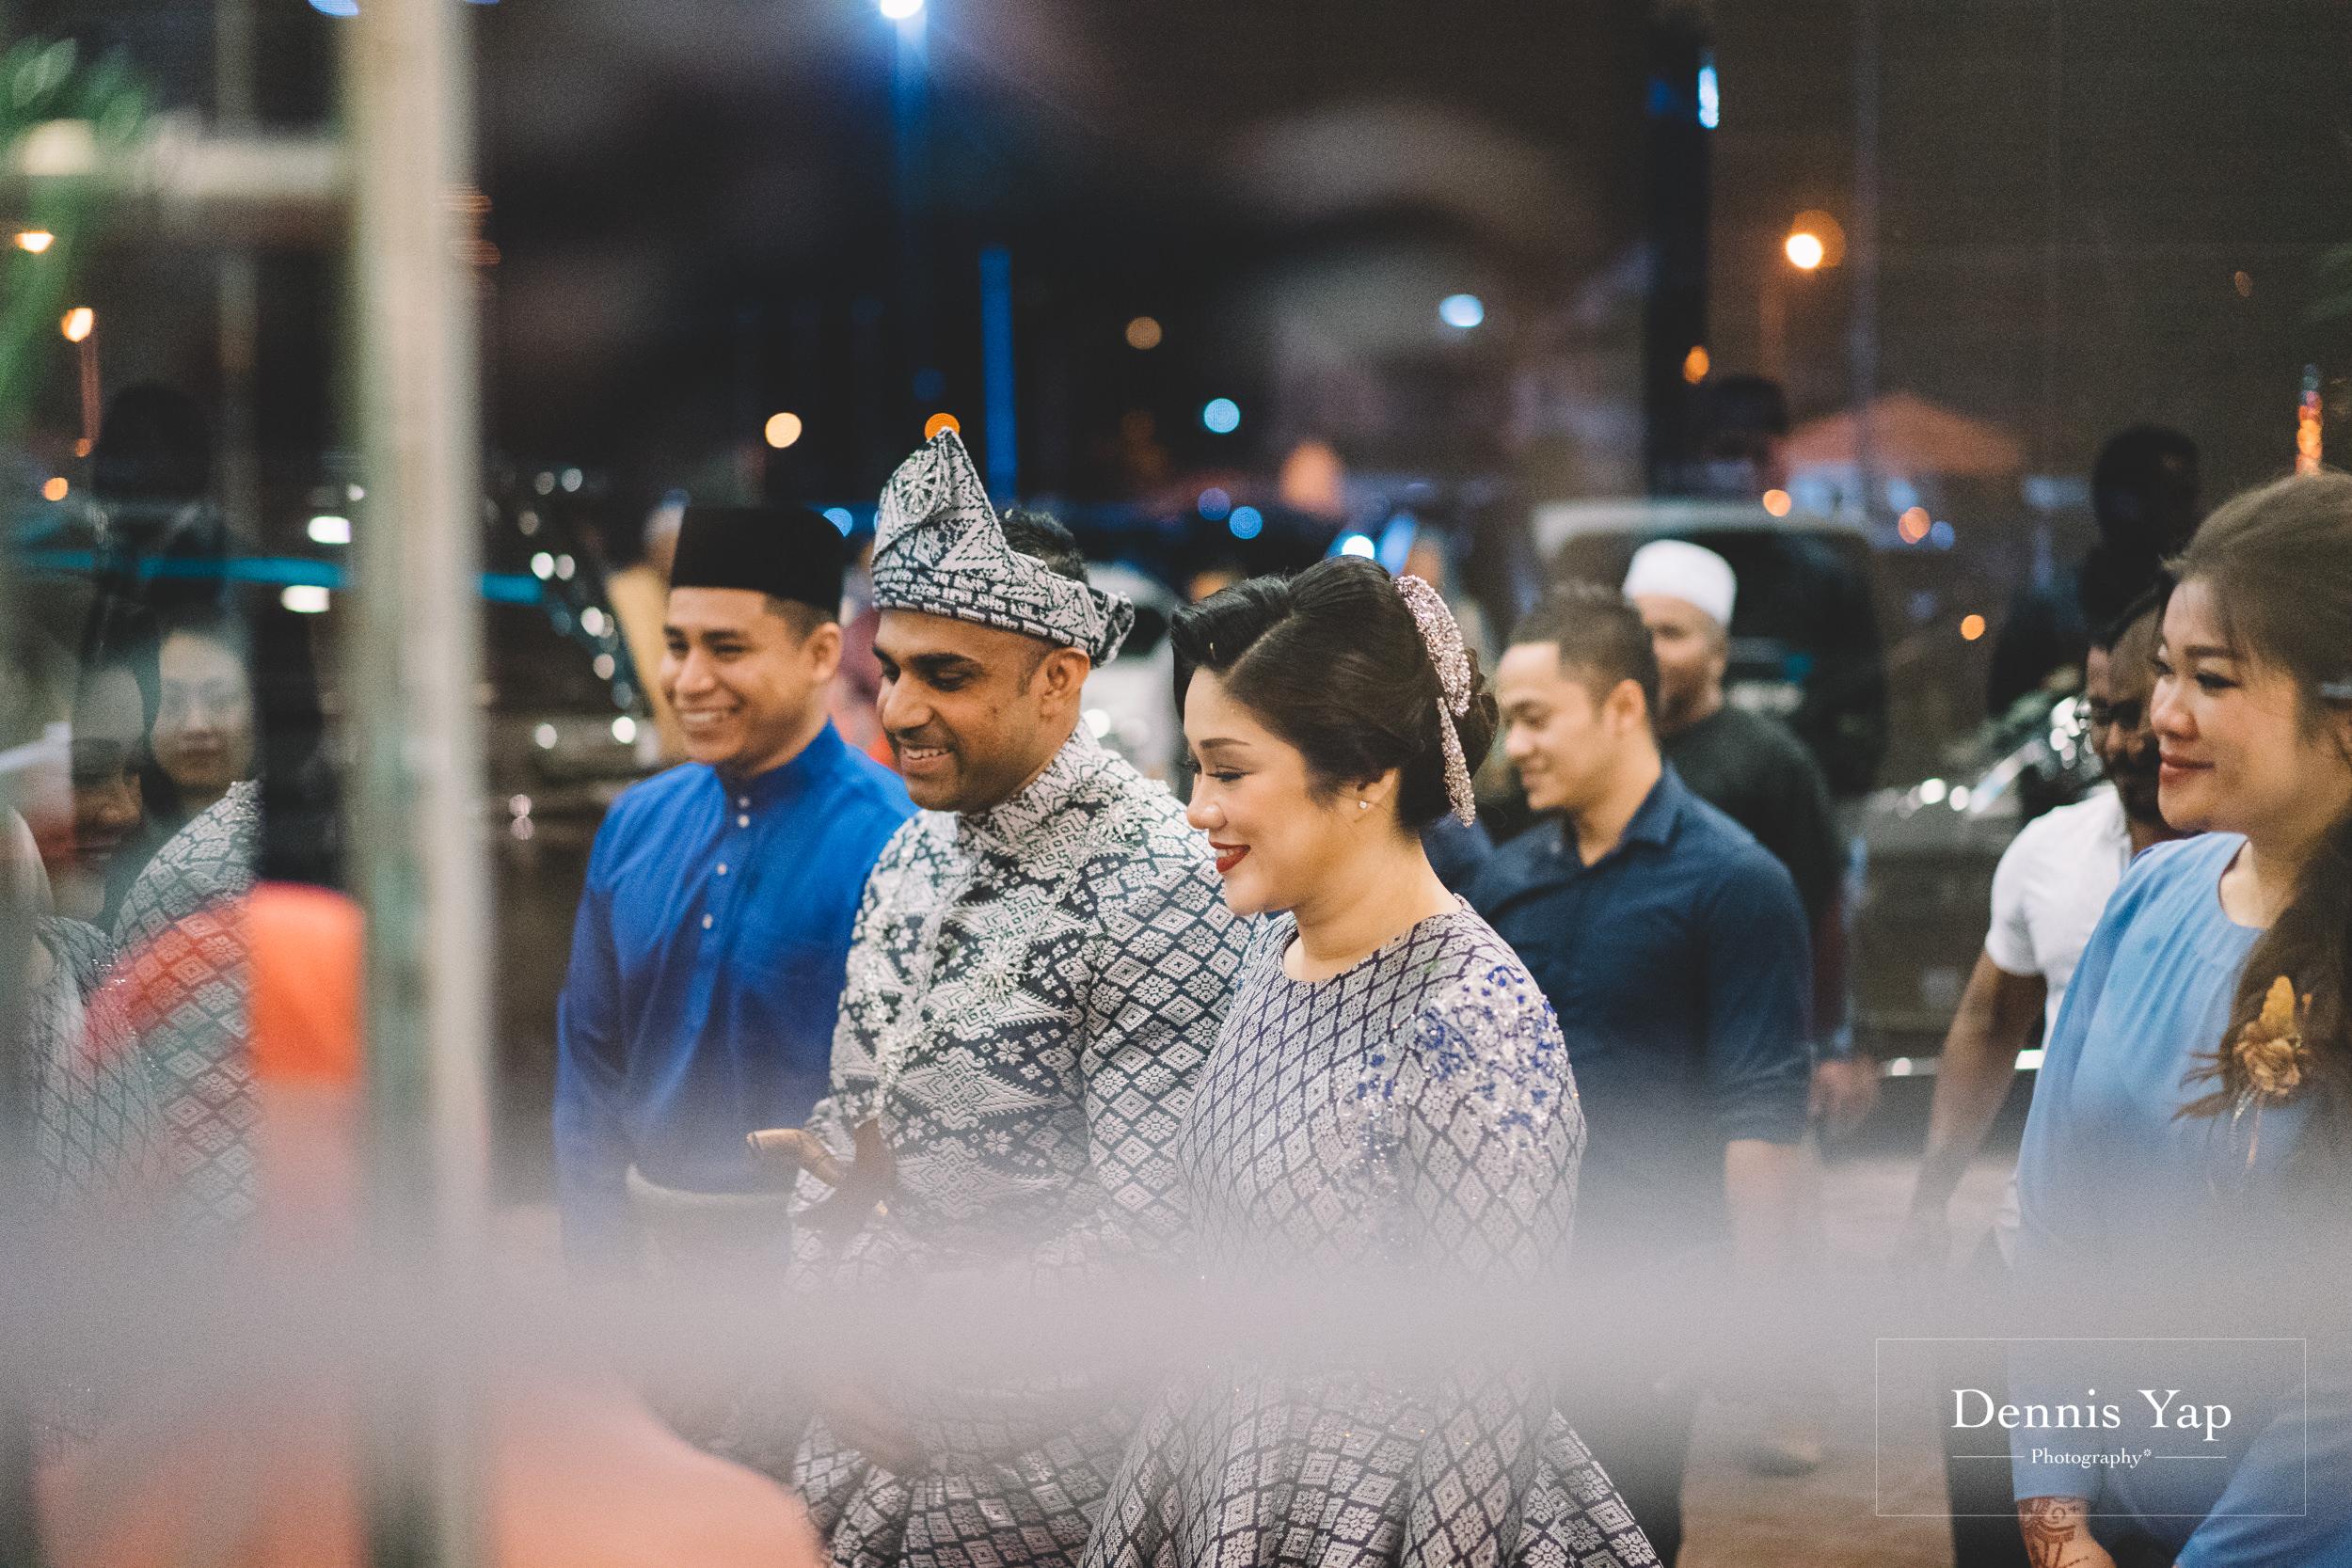 azmi zahraa malay wedding ceremony dennis yap photography malaysia wedding photographer-4.jpg